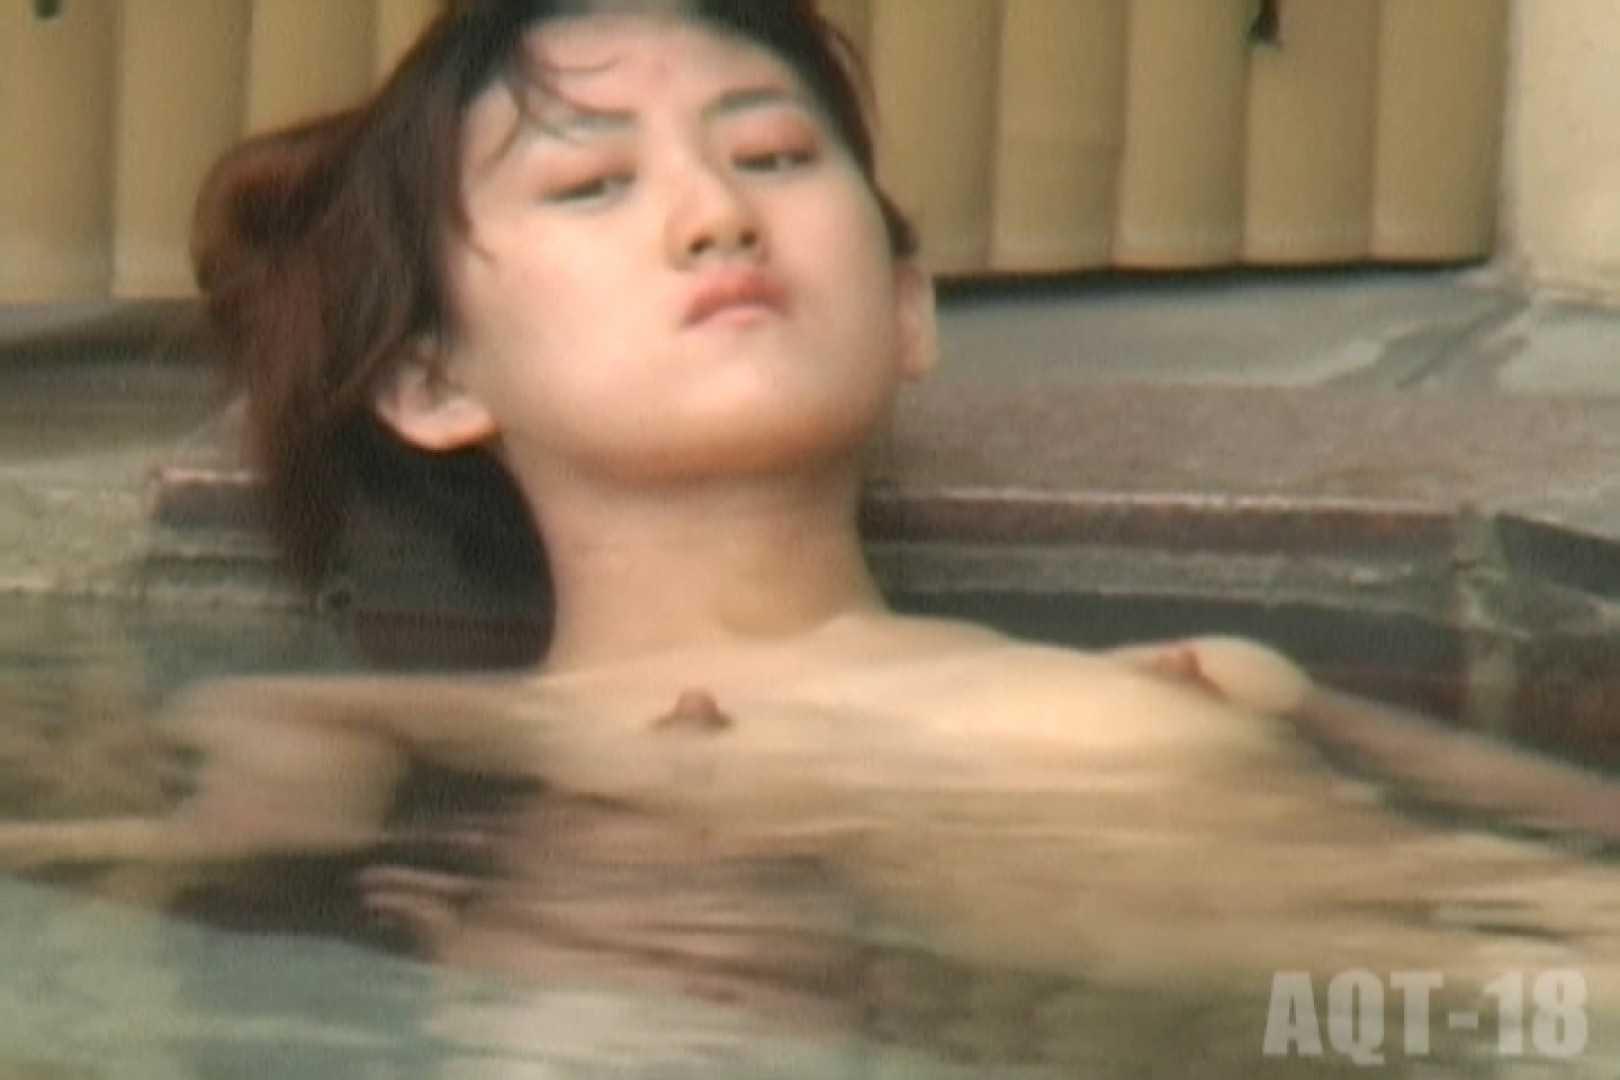 Aquaな露天風呂Vol.862 盗撮師作品  99pic 54